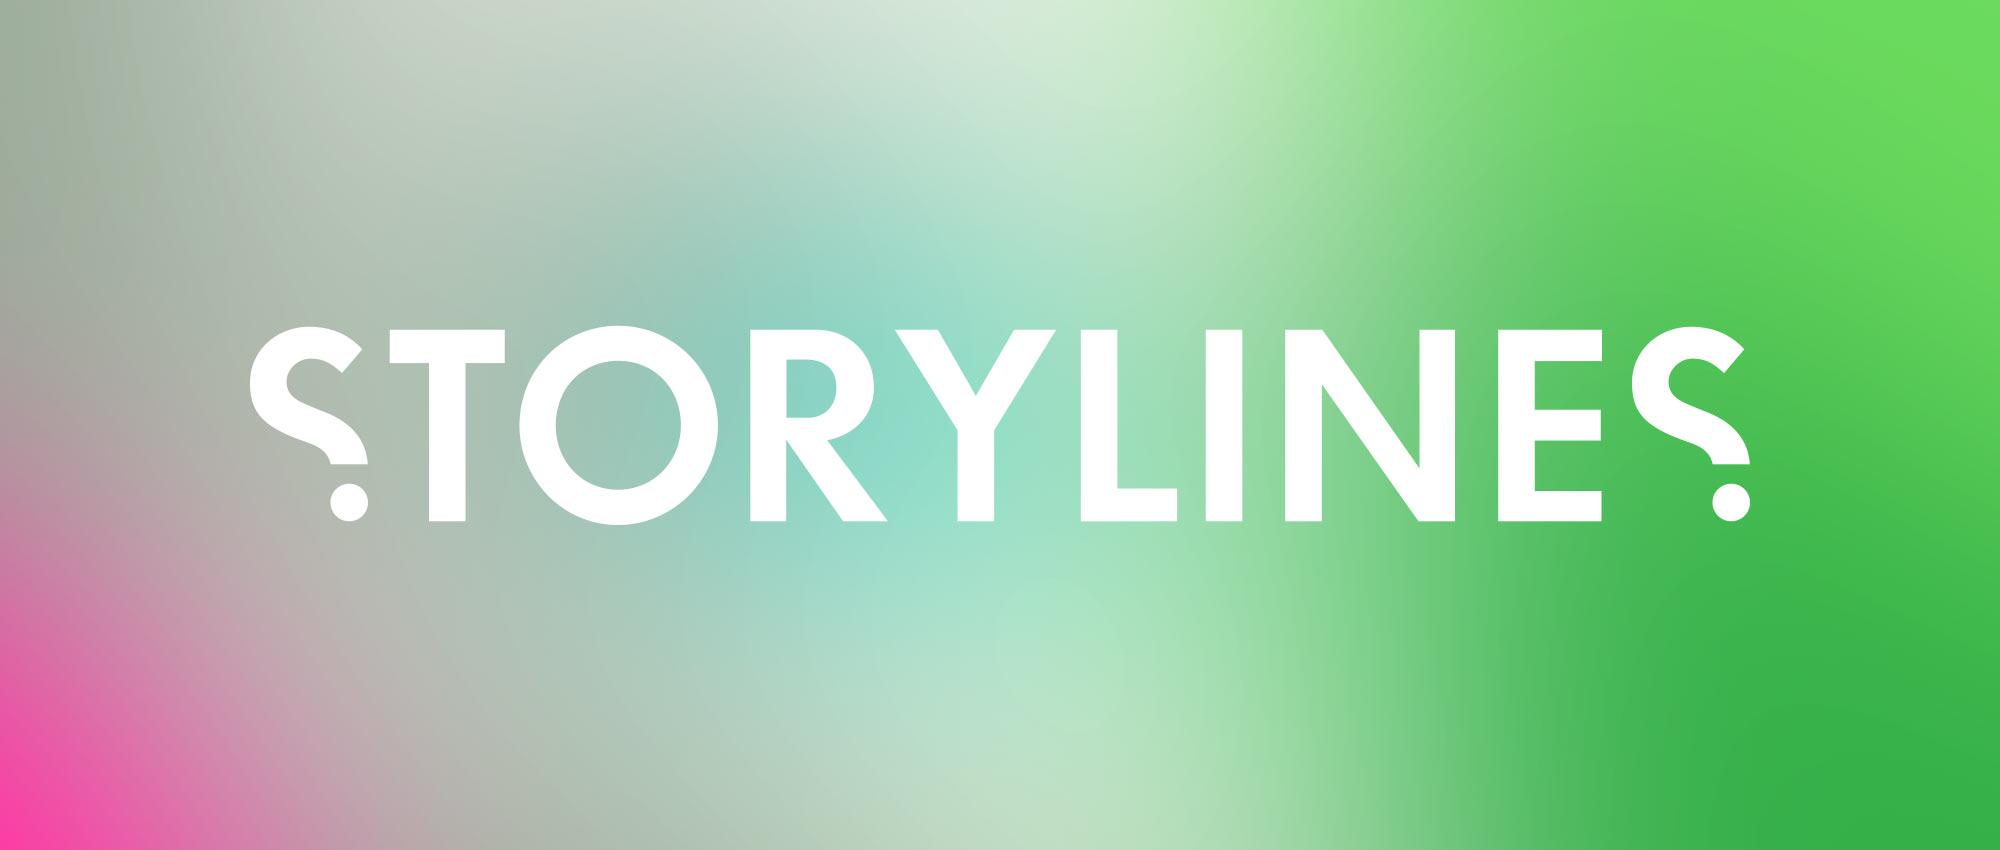 Storylines_logo